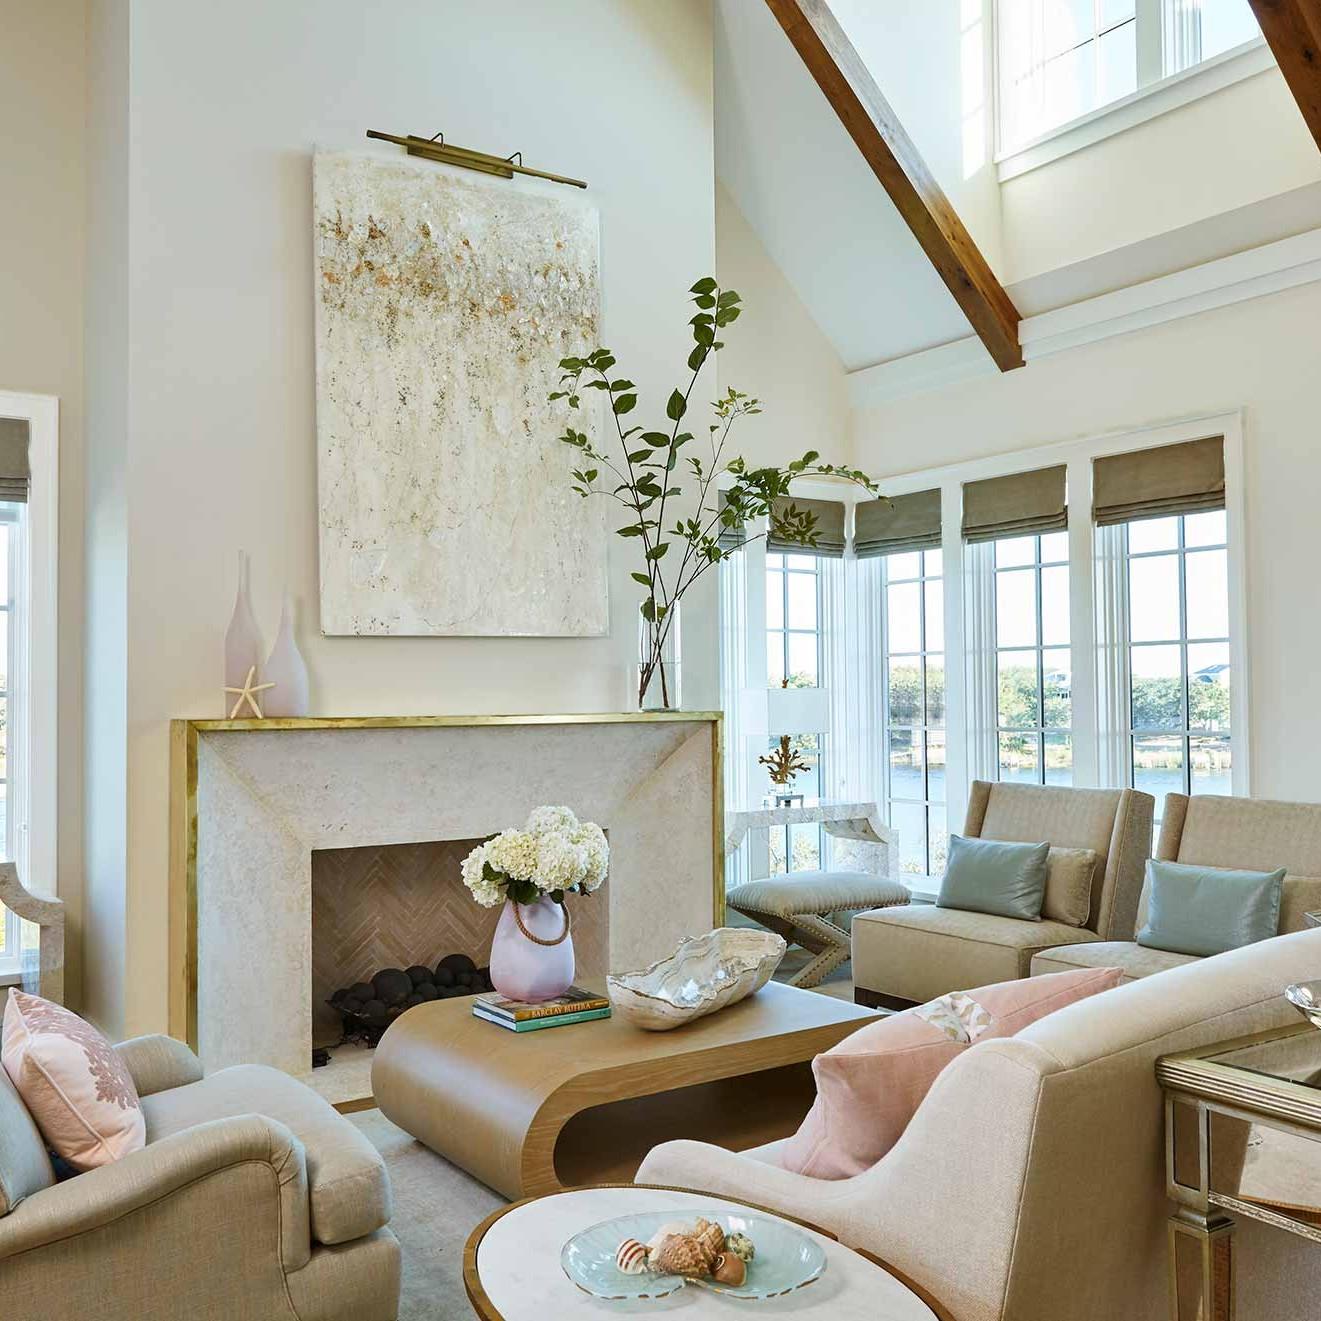 Watersound beach open concept living room interior design by Darci Hether New York